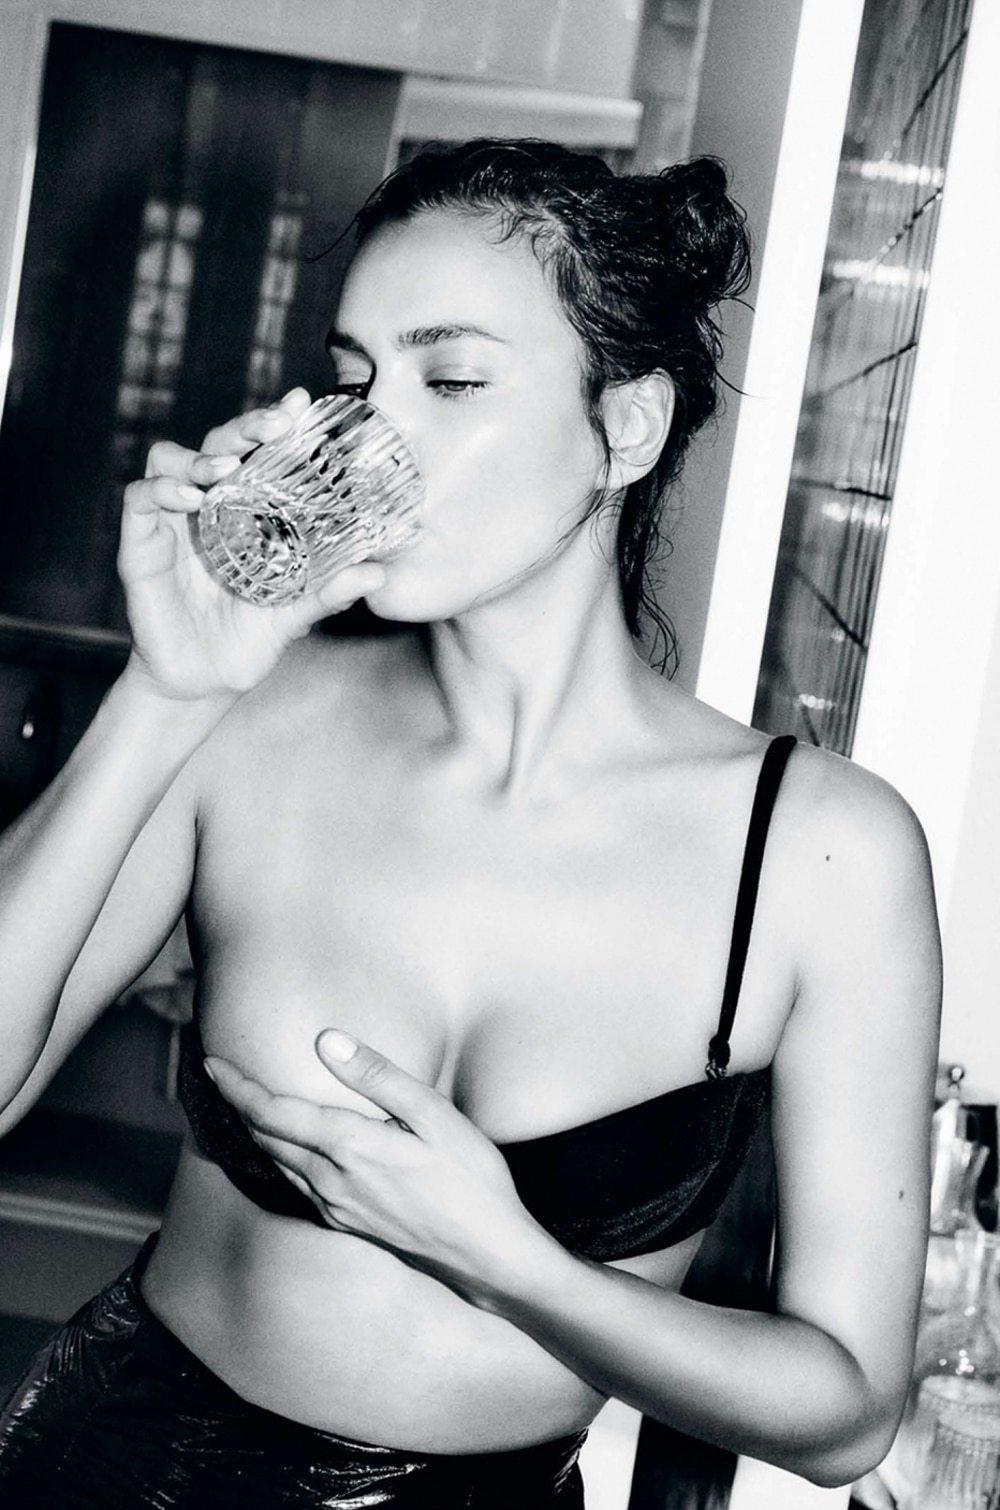 Irina Shayk - Evening Standard Magazine Scans - Sexy Actress Pictures | Hot Actress Pictures - ActressSnaps.com